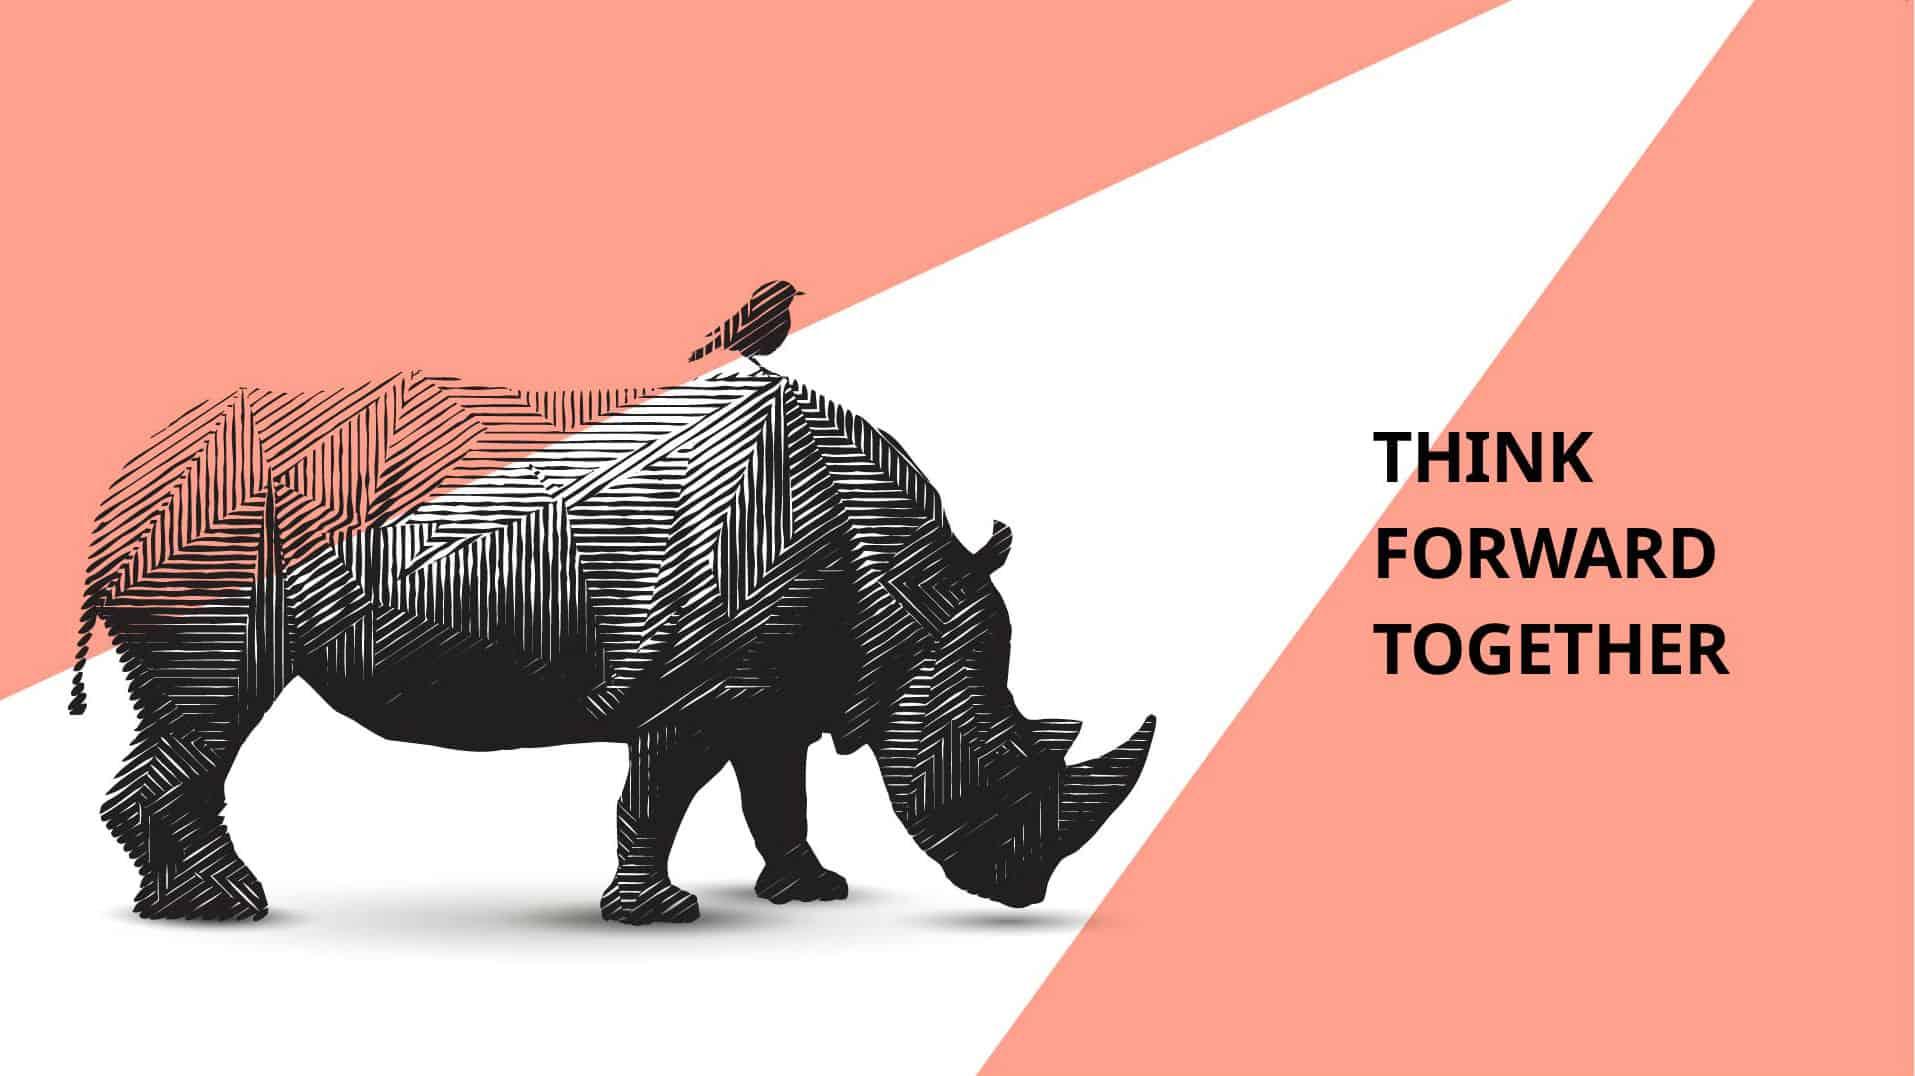 Think Forward Together